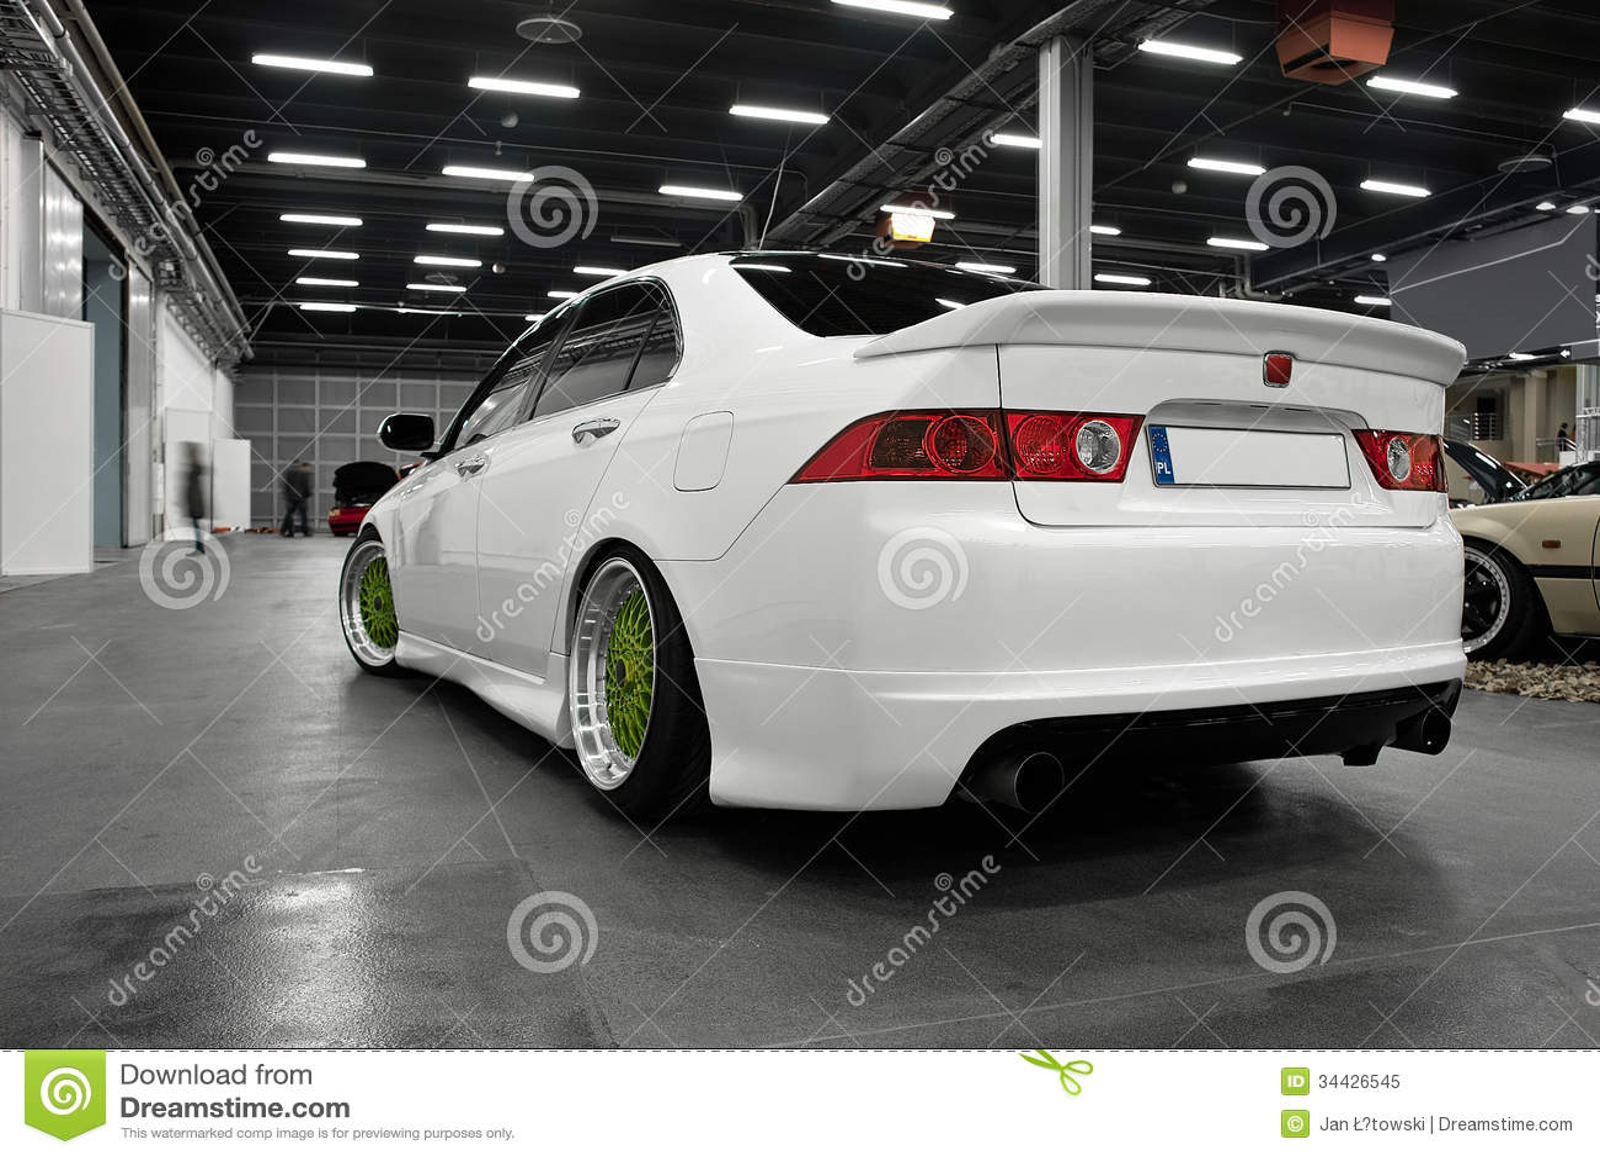 Japan sport car honda accord stock image image 34426545 for Sporty honda cars